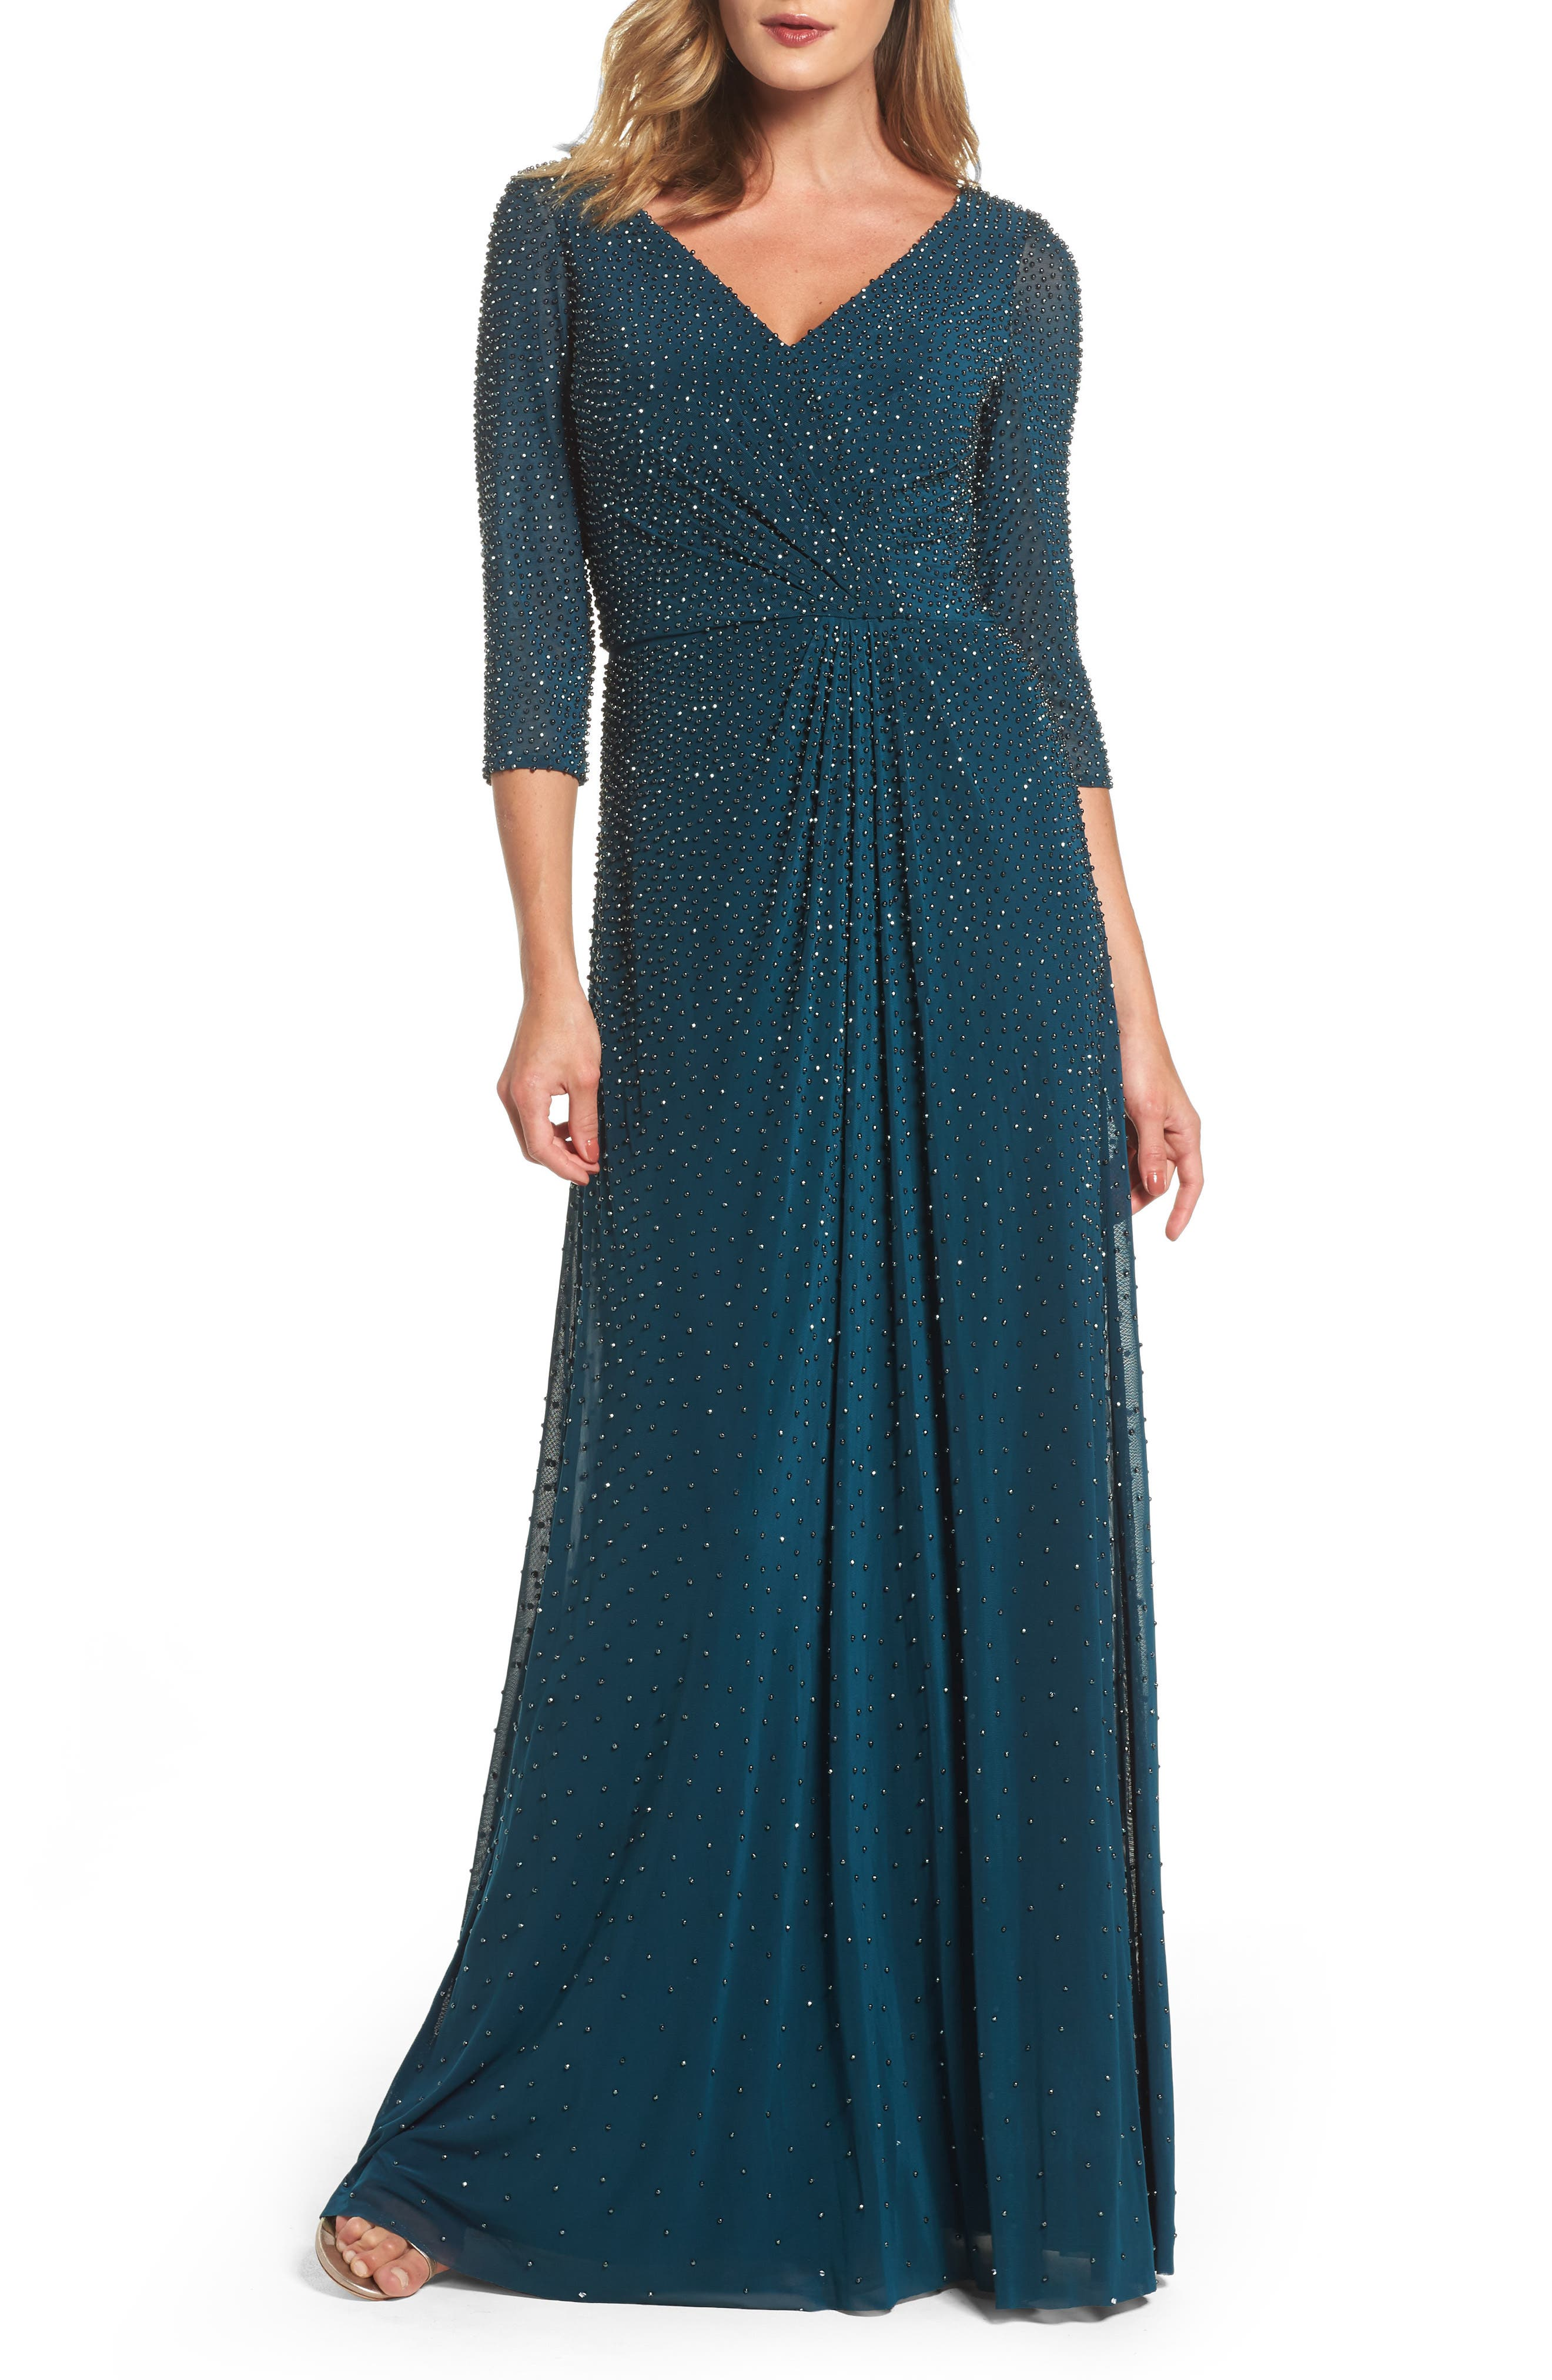 Main Image - La Femme Beaded Twist Knot Waist Gown